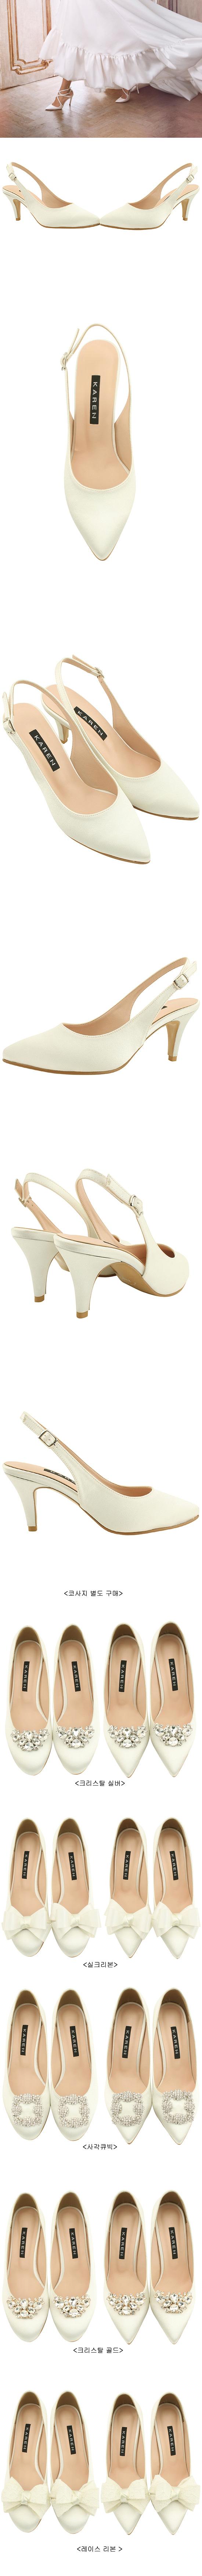 Wedding Shoes Stiletto Slingback High Heels 7cm